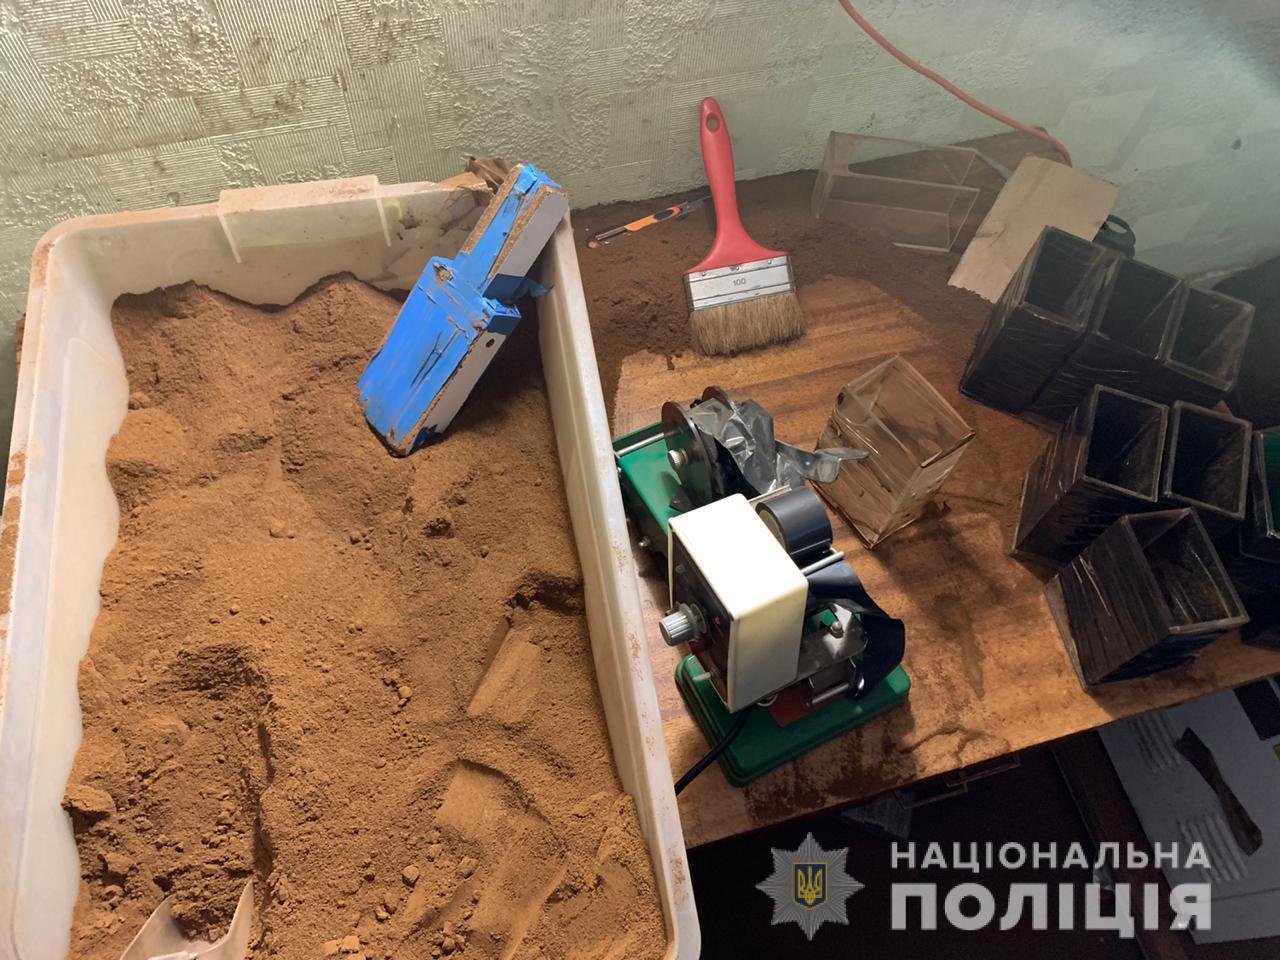 Нелегальна кава по-київськи: викрито підпільне виробництво - кава, бренди - 18.11.202cyberpolice